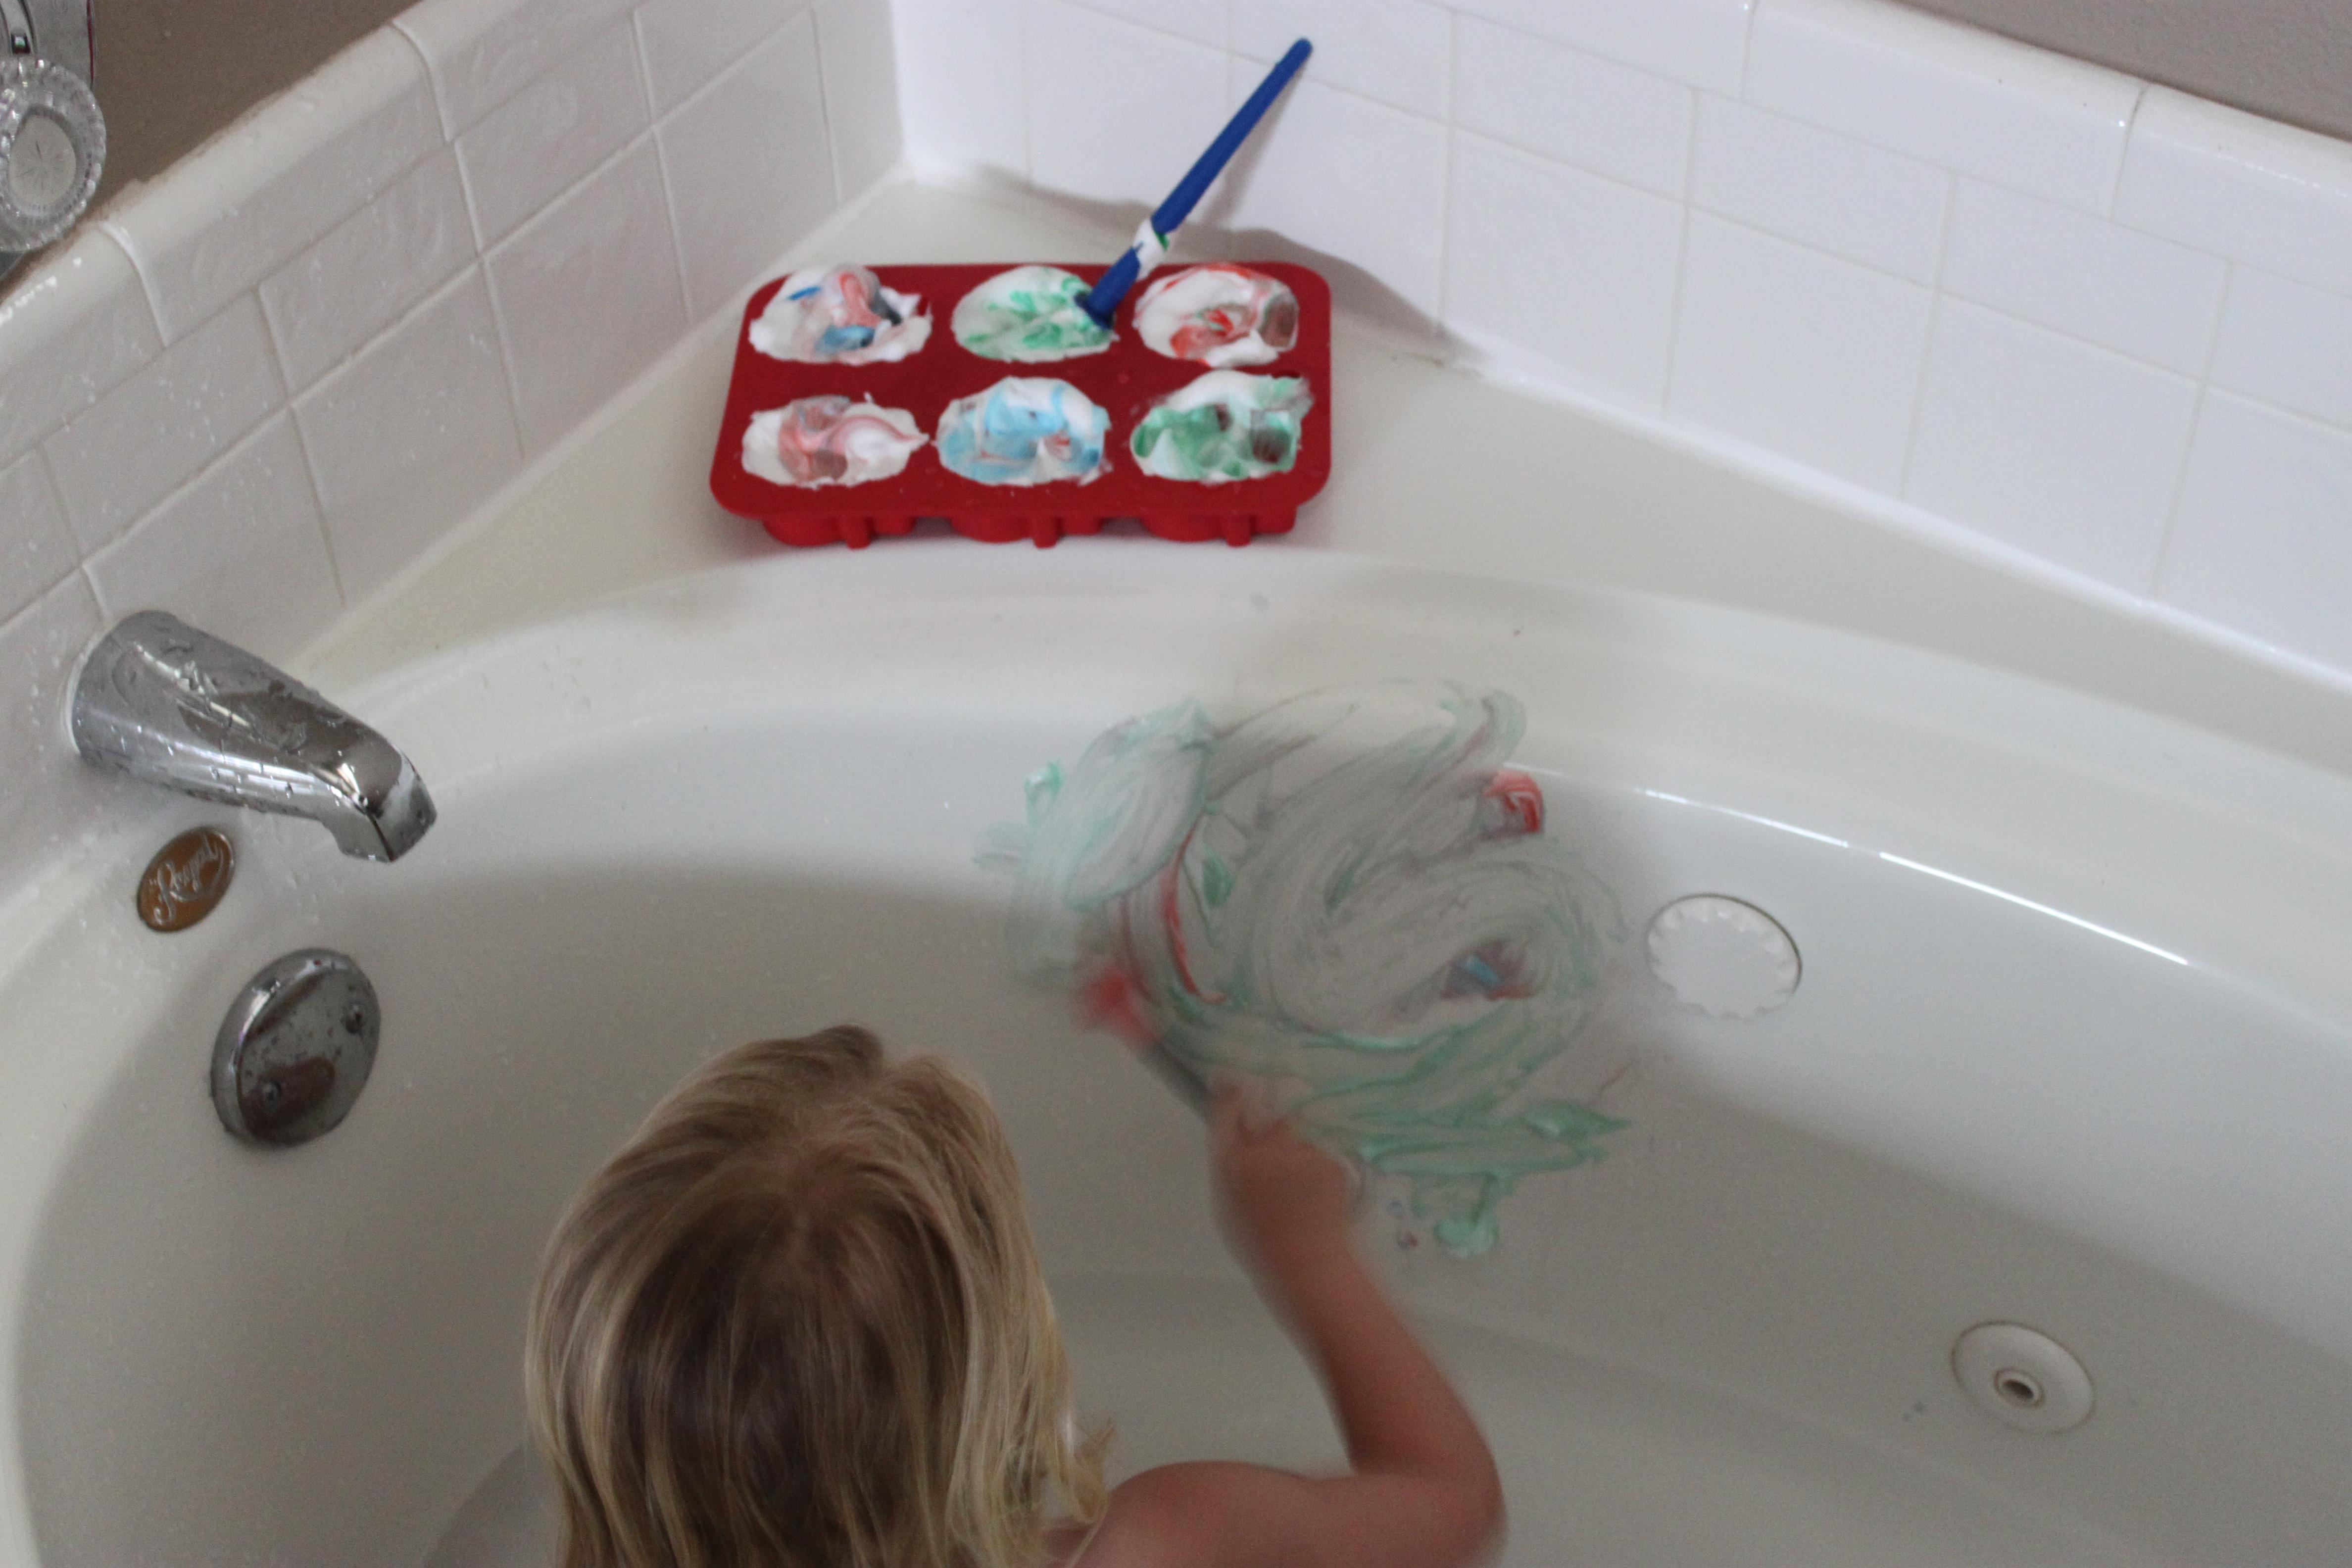 Shaving Cream Bath Tub Paint